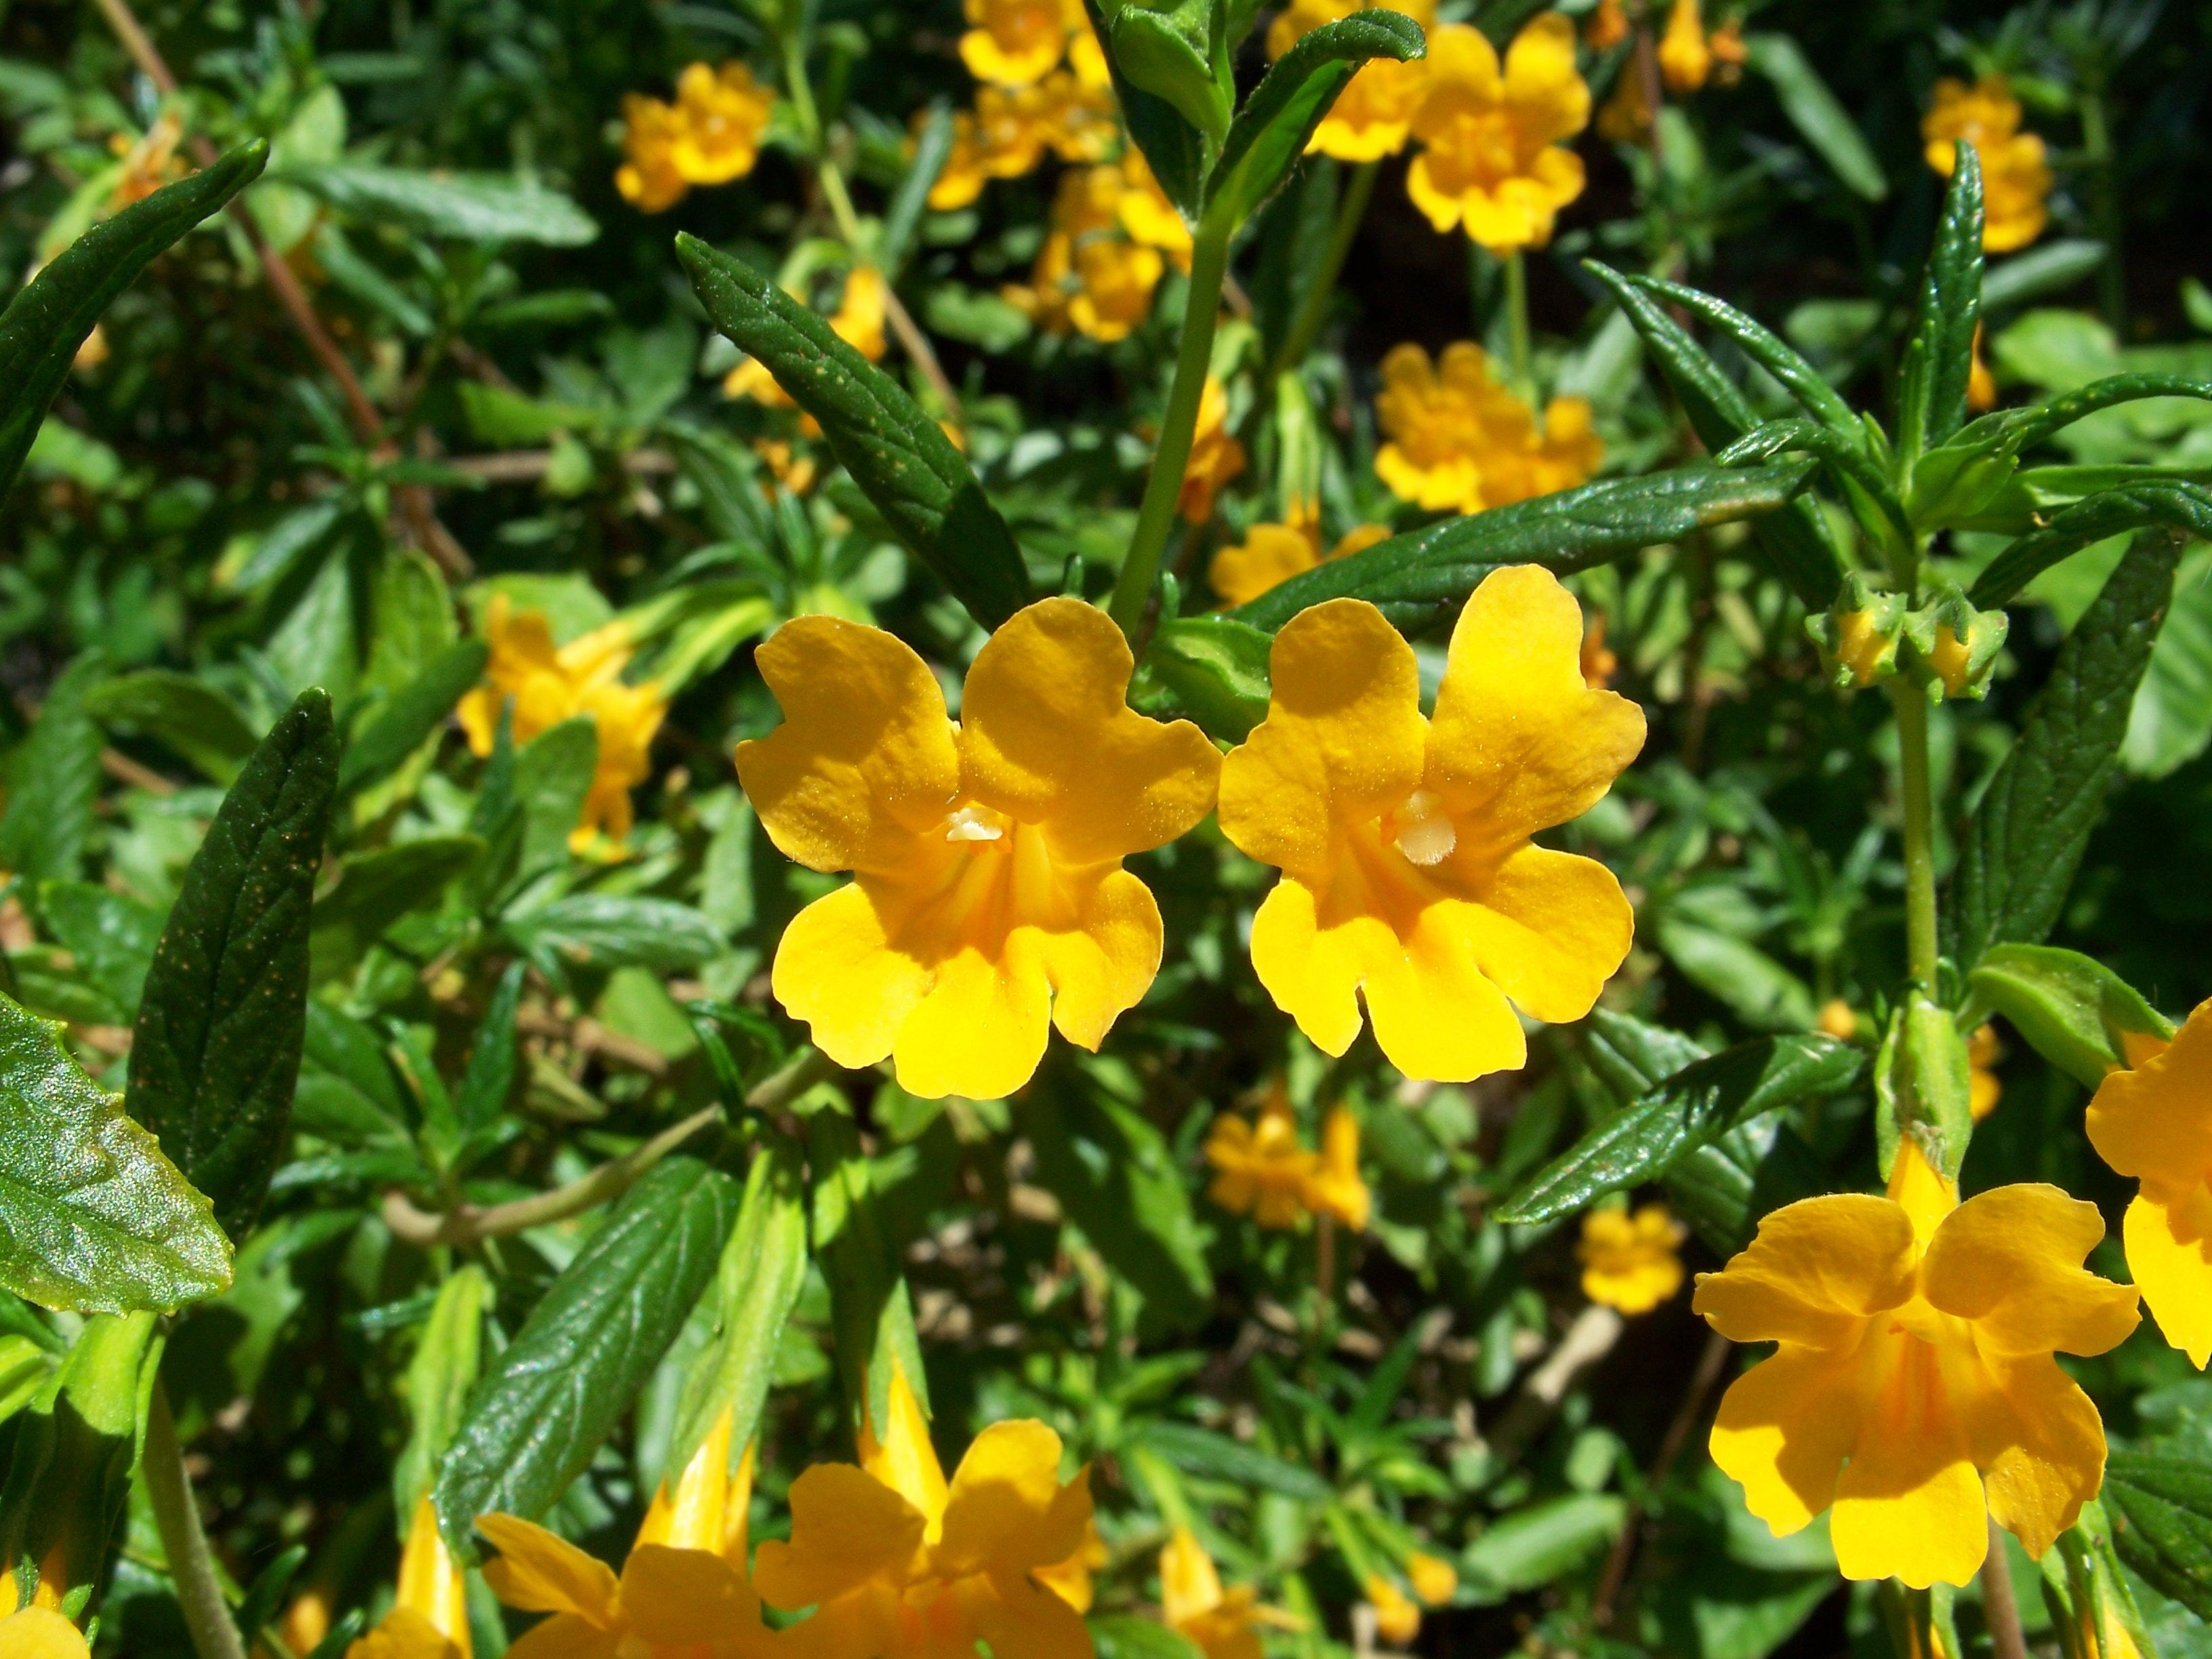 Bush Plants With Flowers